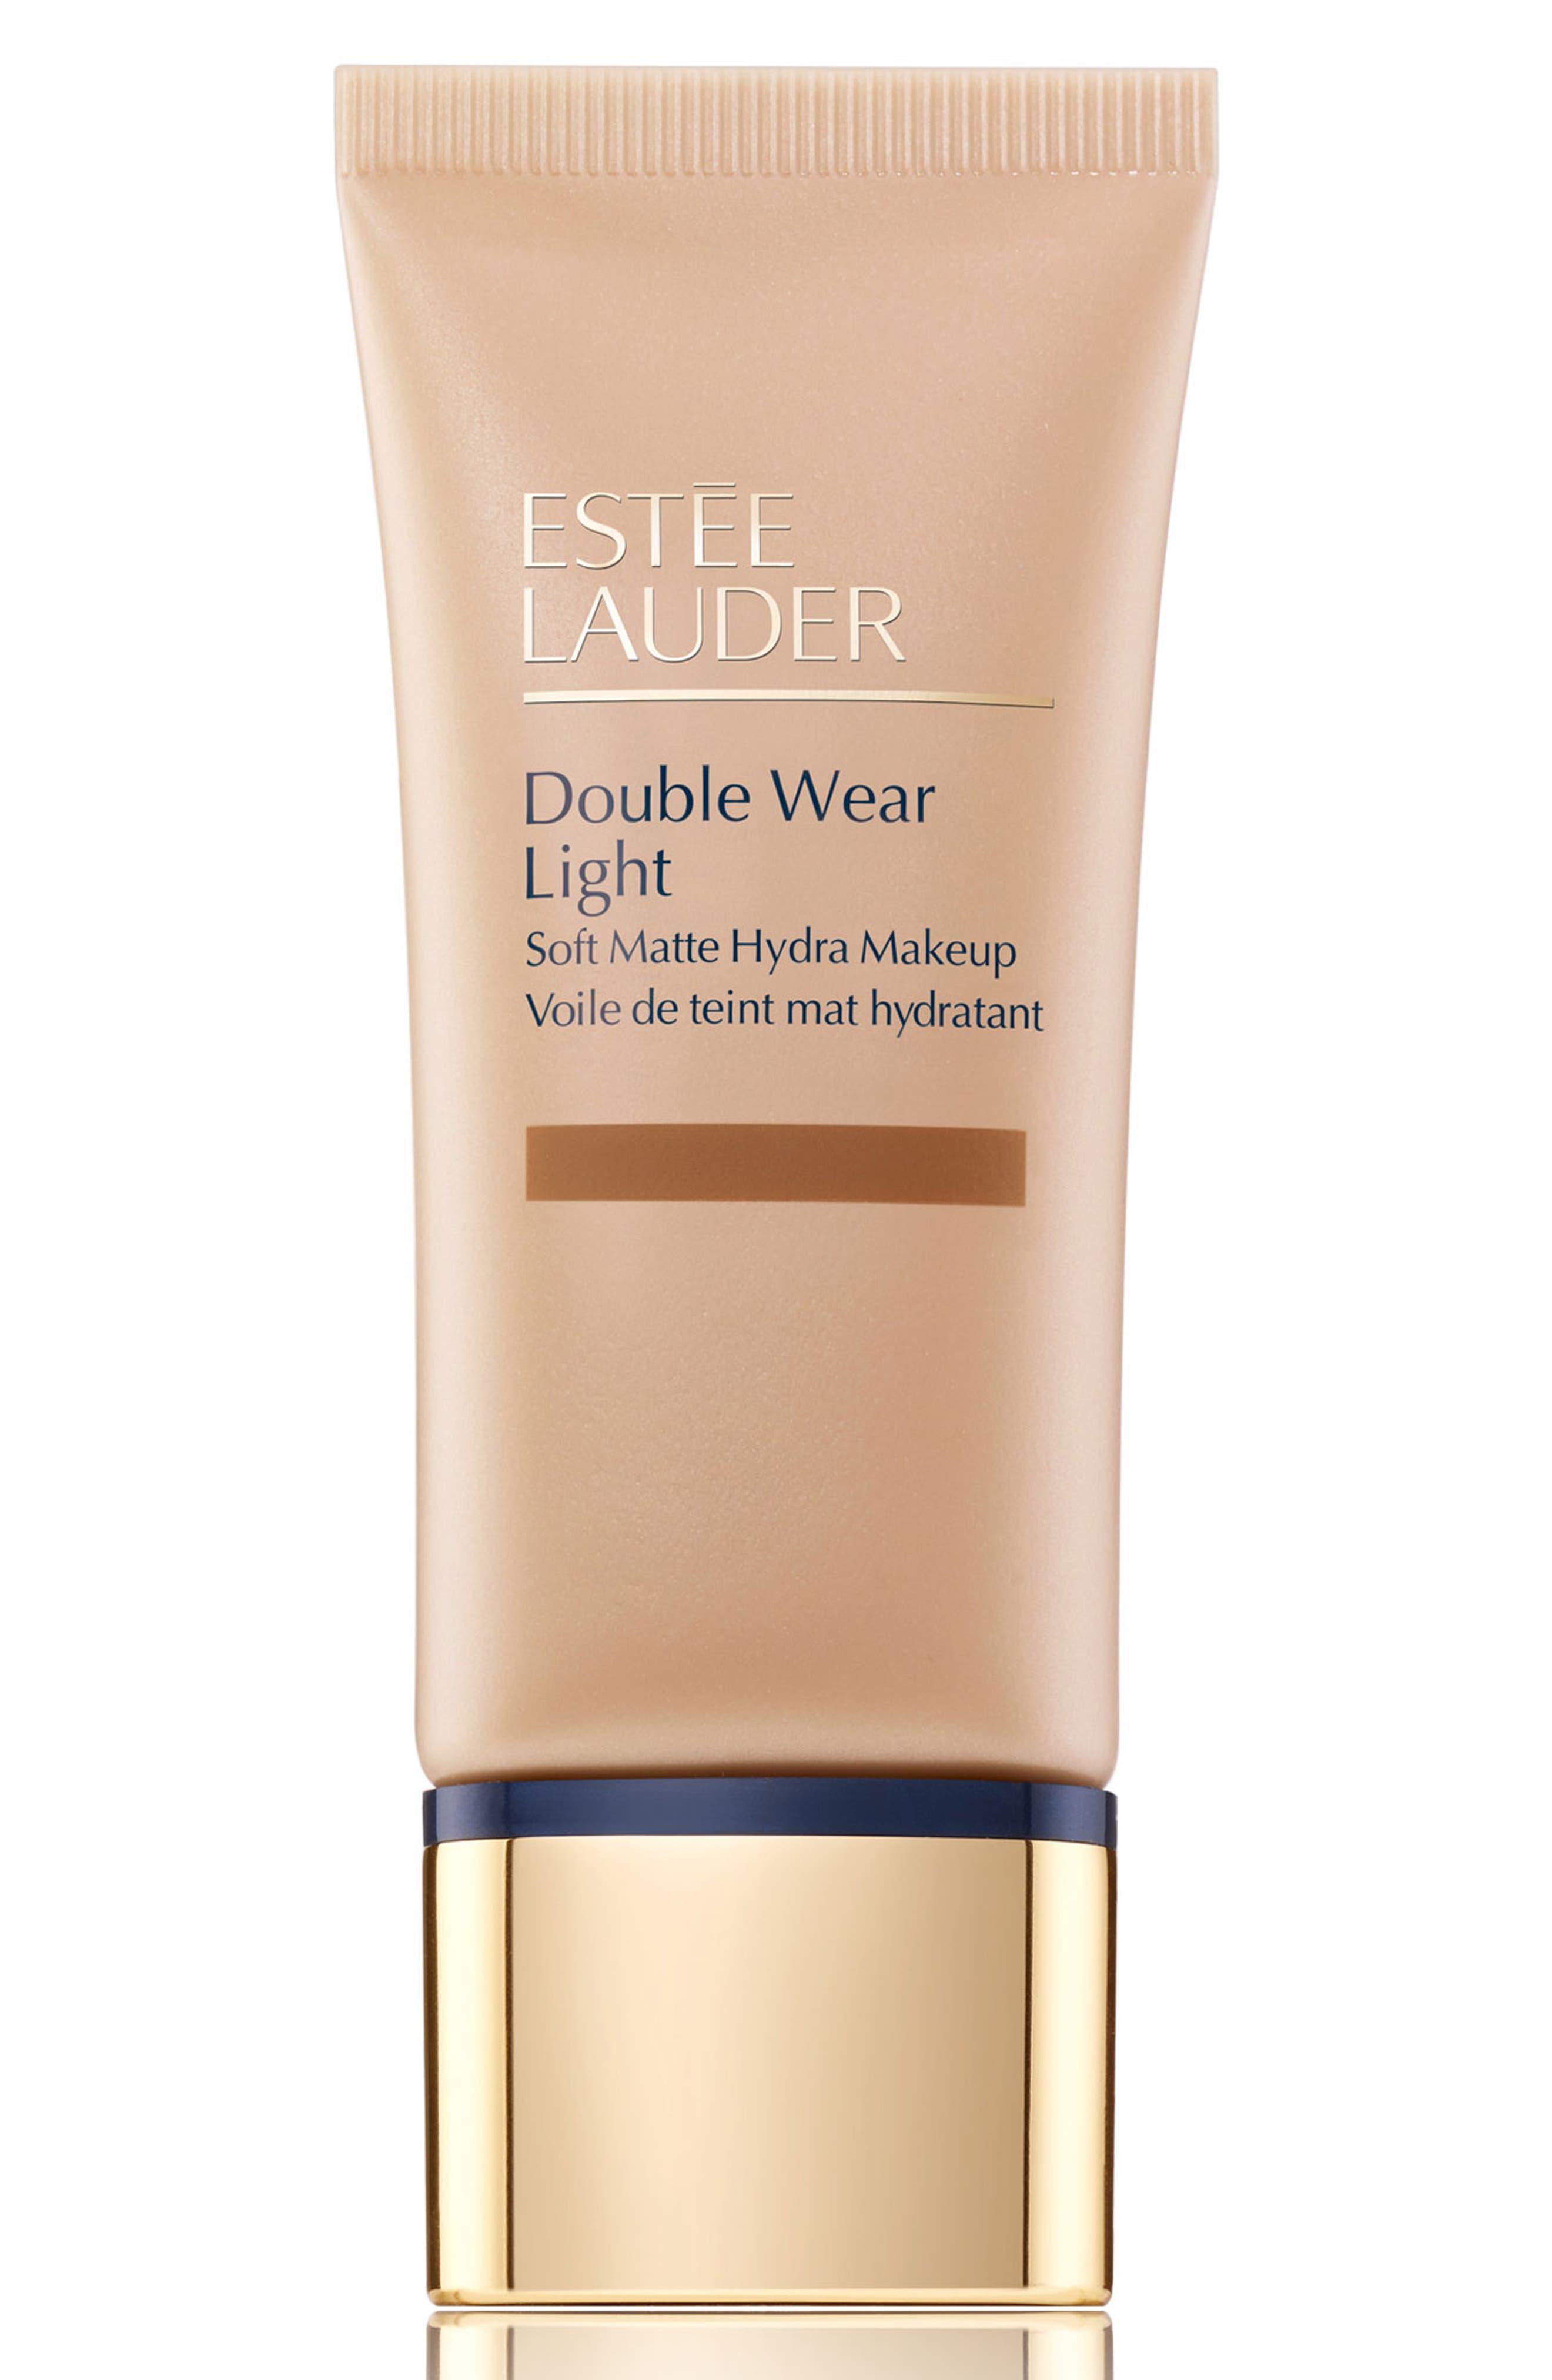 Estee Lauder Double Wear Light Soft Matte Hydra Makeup - 6W1 Sandalwood